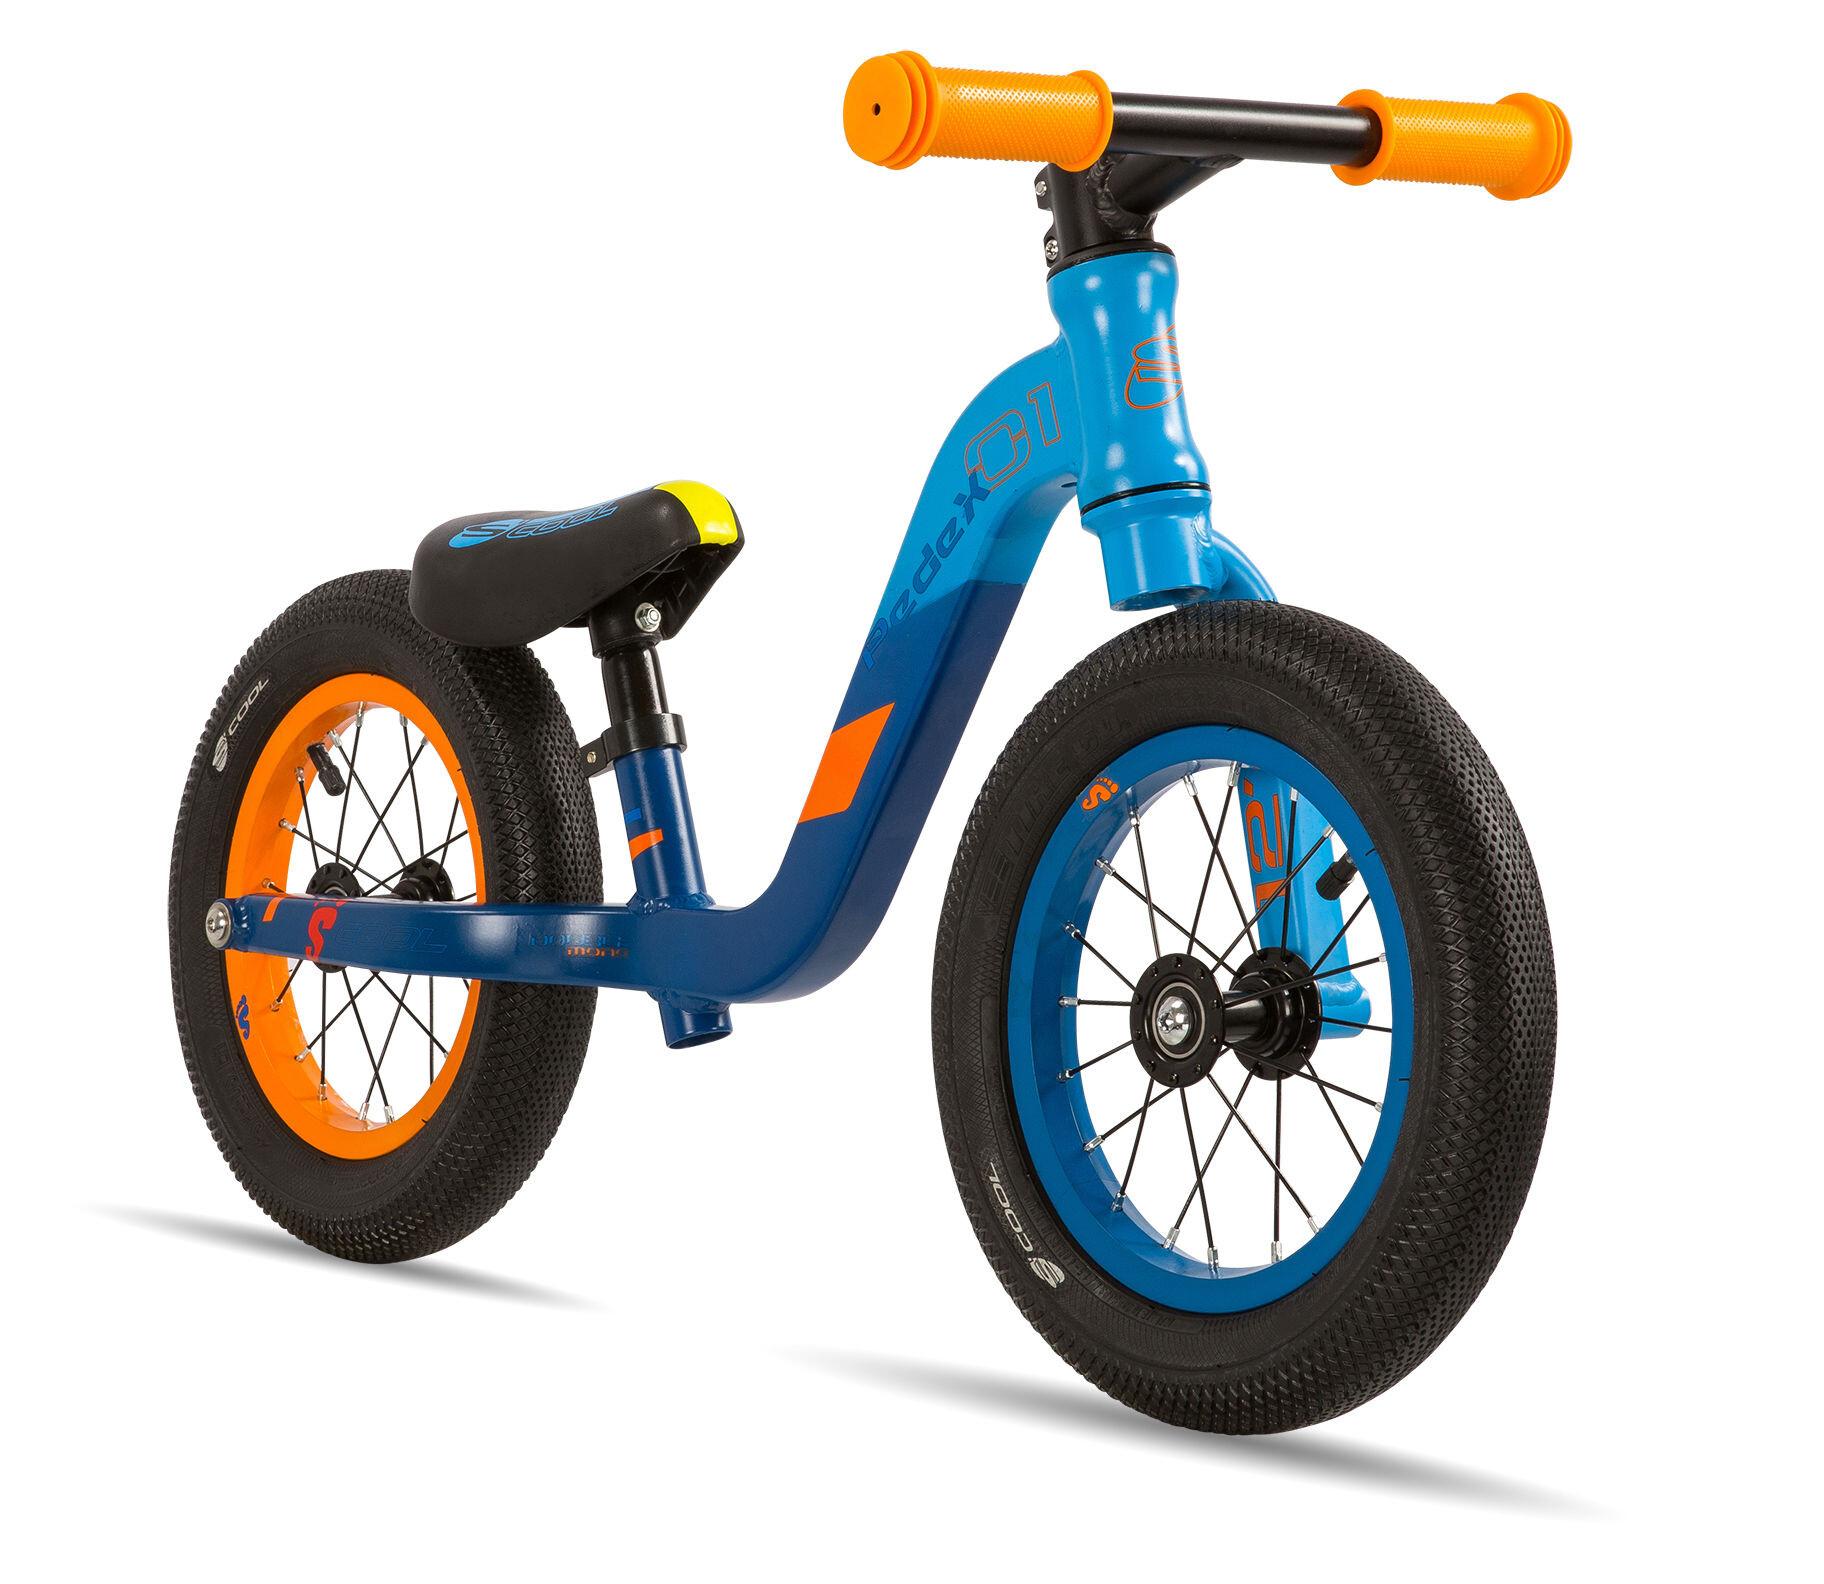 s'cool pedeX 1 Børn, blue/orange matt (2020) | Learner Bikes